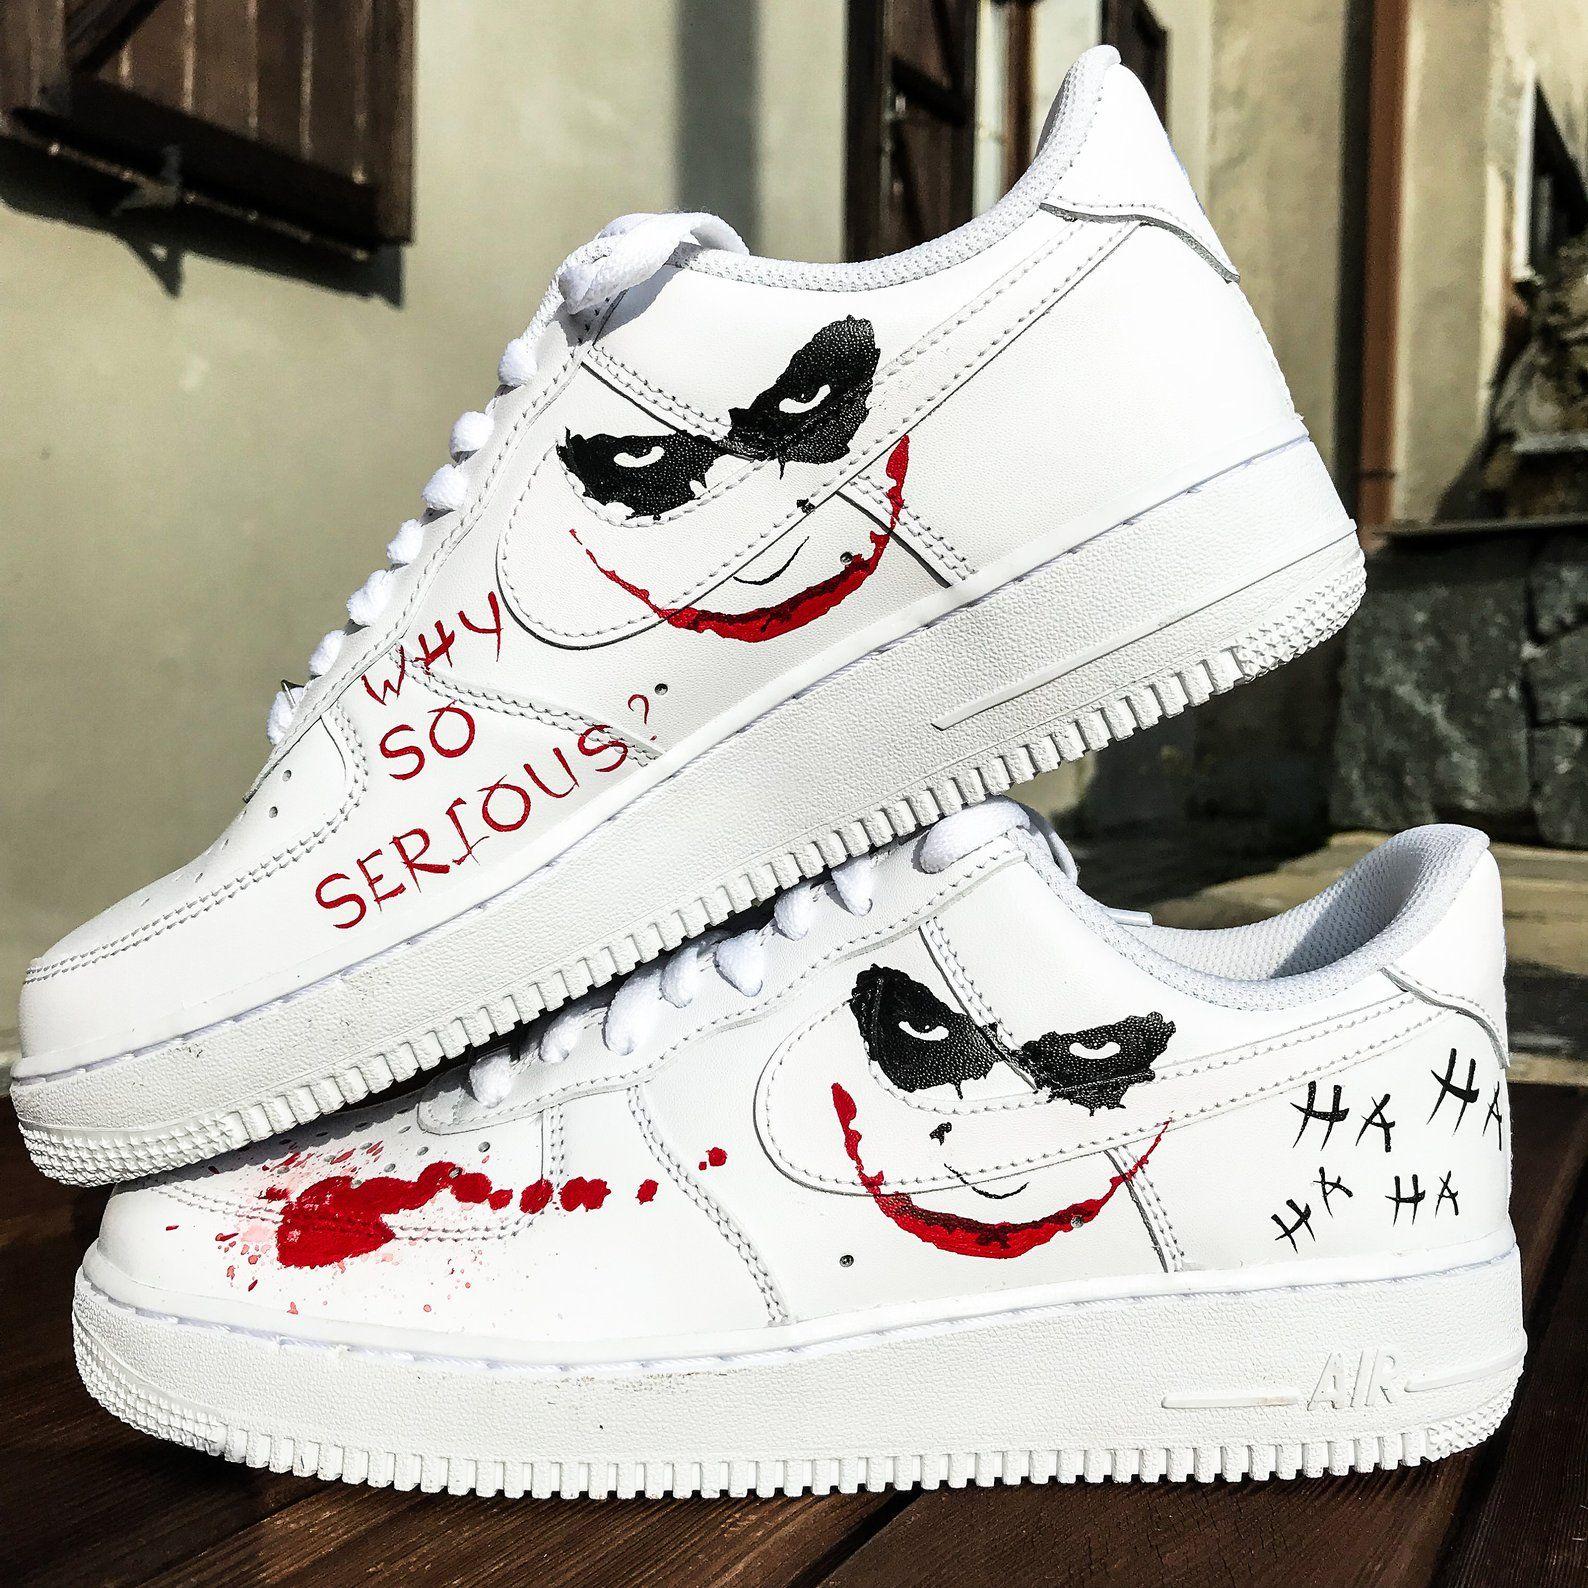 Create your own custom sneakers in 2020